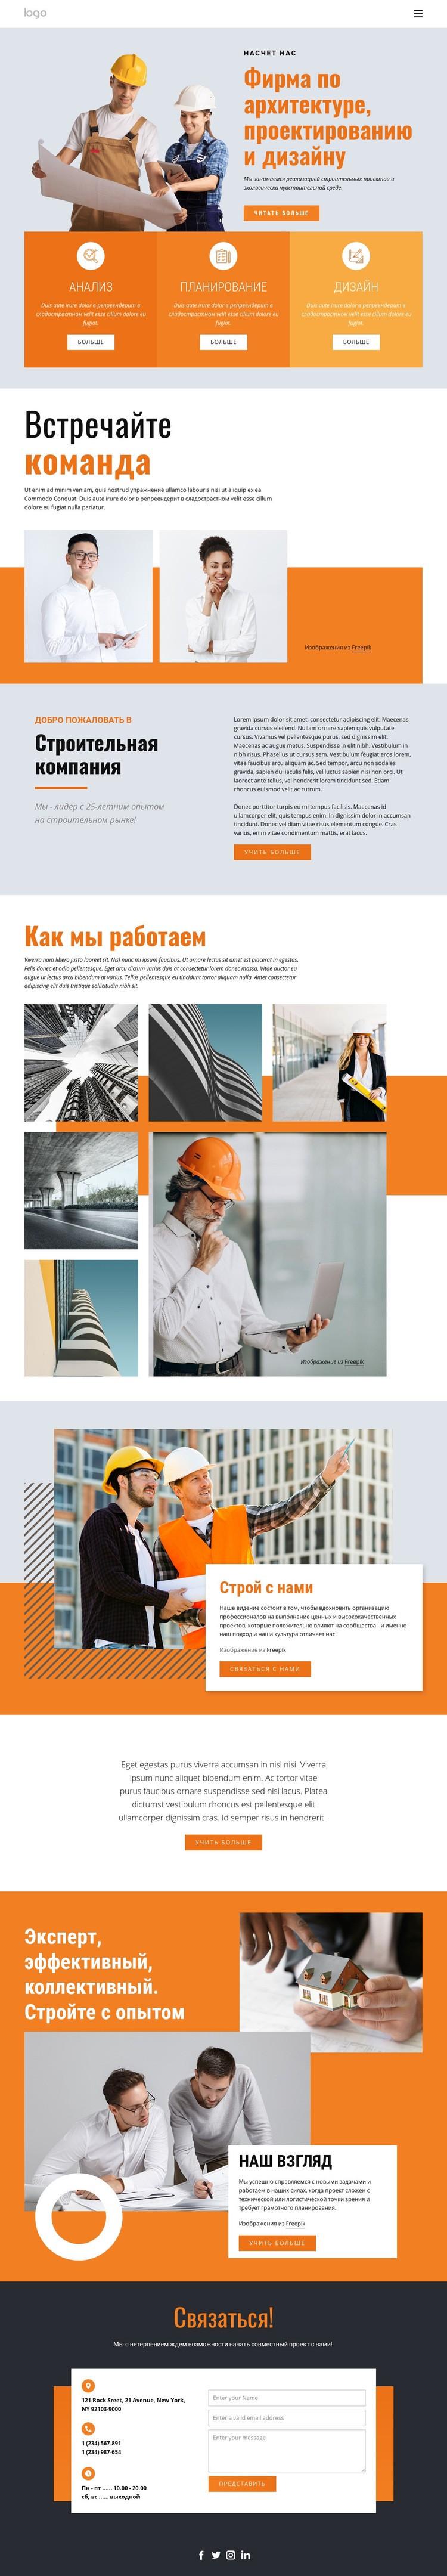 Инжиниринговая фирма Шаблон веб-сайта